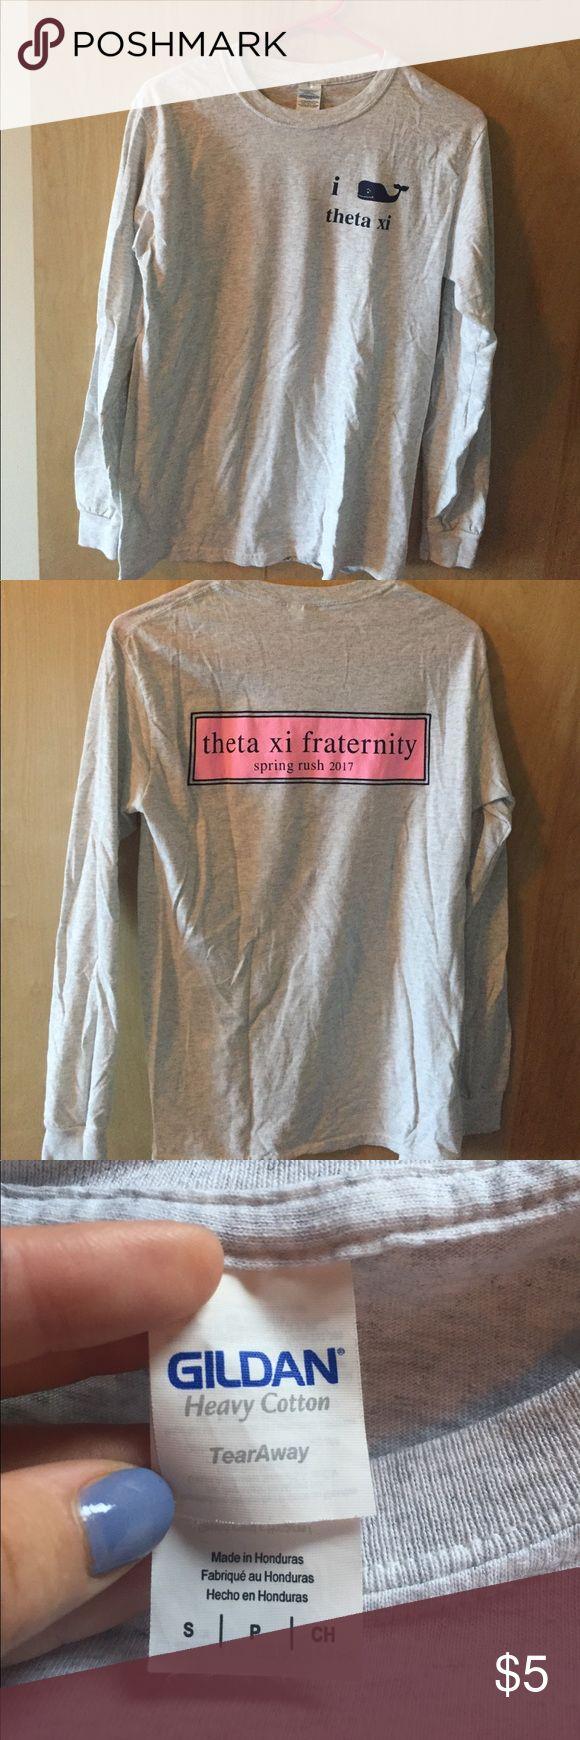 Vineyard vines Theta Xi fraternity shirt Long sleeve light grey Gildan size small shirt. Never worn. Theta Xi fraternity spring rush 2017. Gildan Tops Tees - Long Sleeve